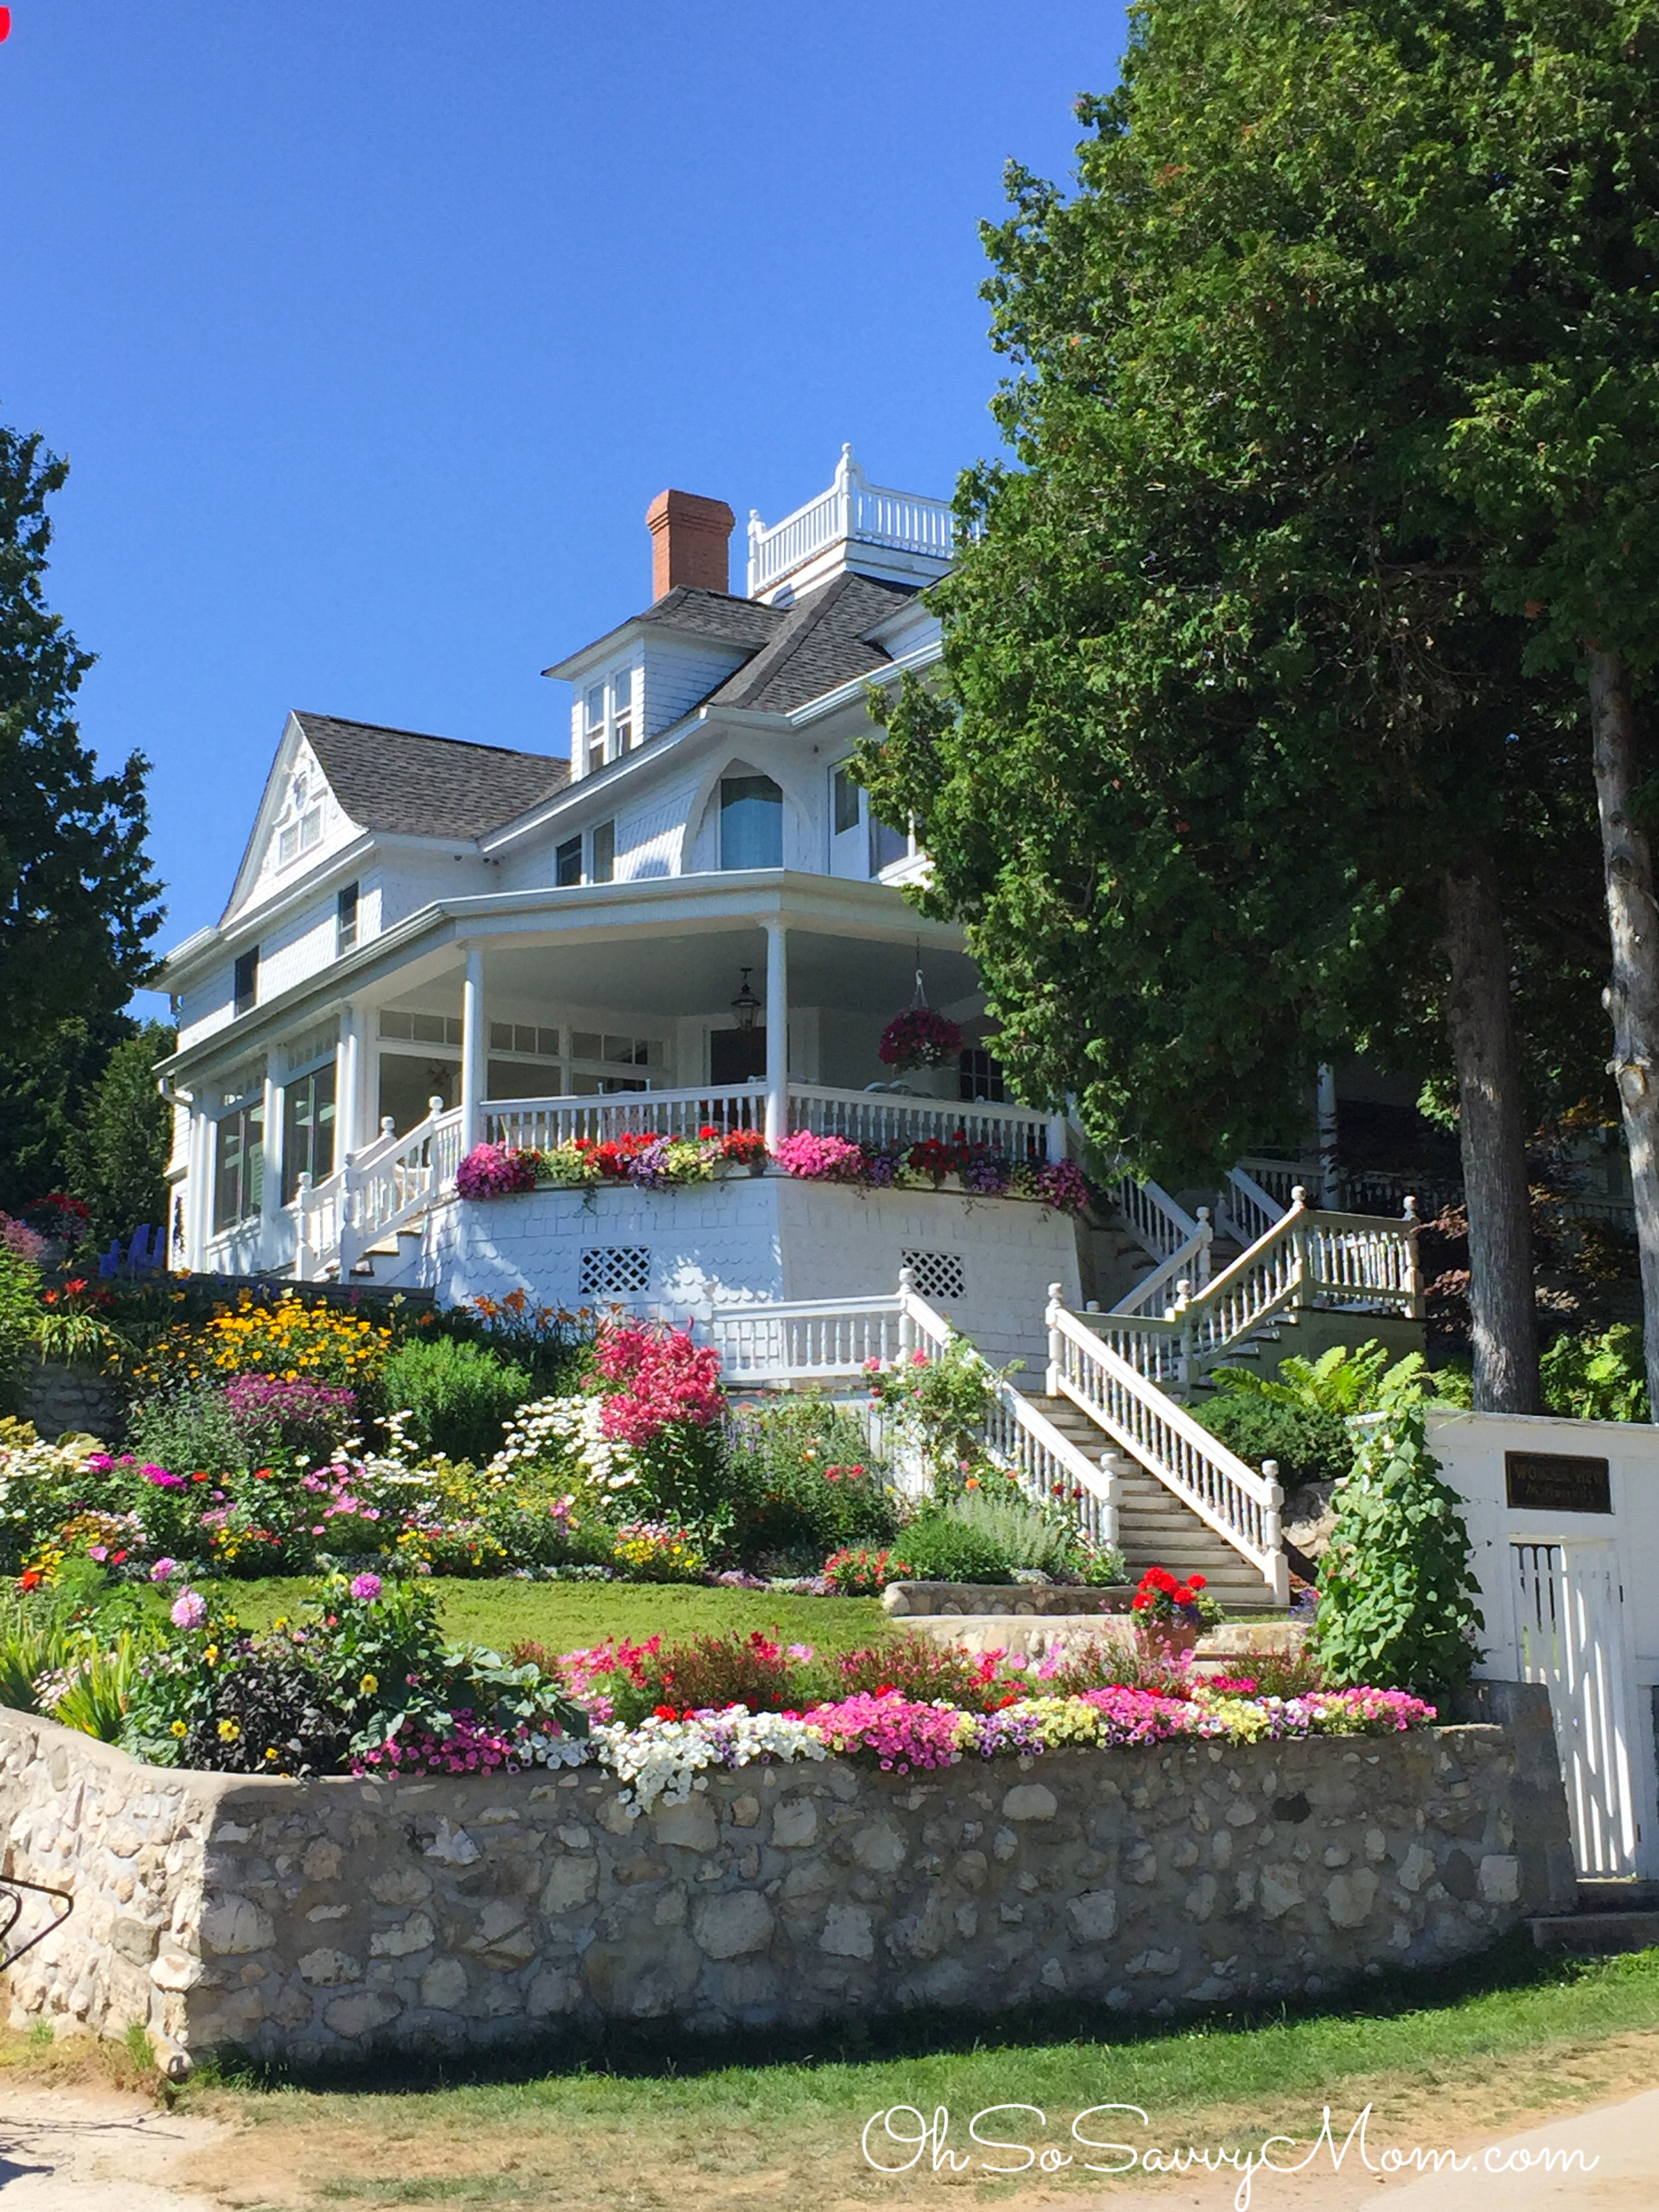 Vacation home on Mackinac Island